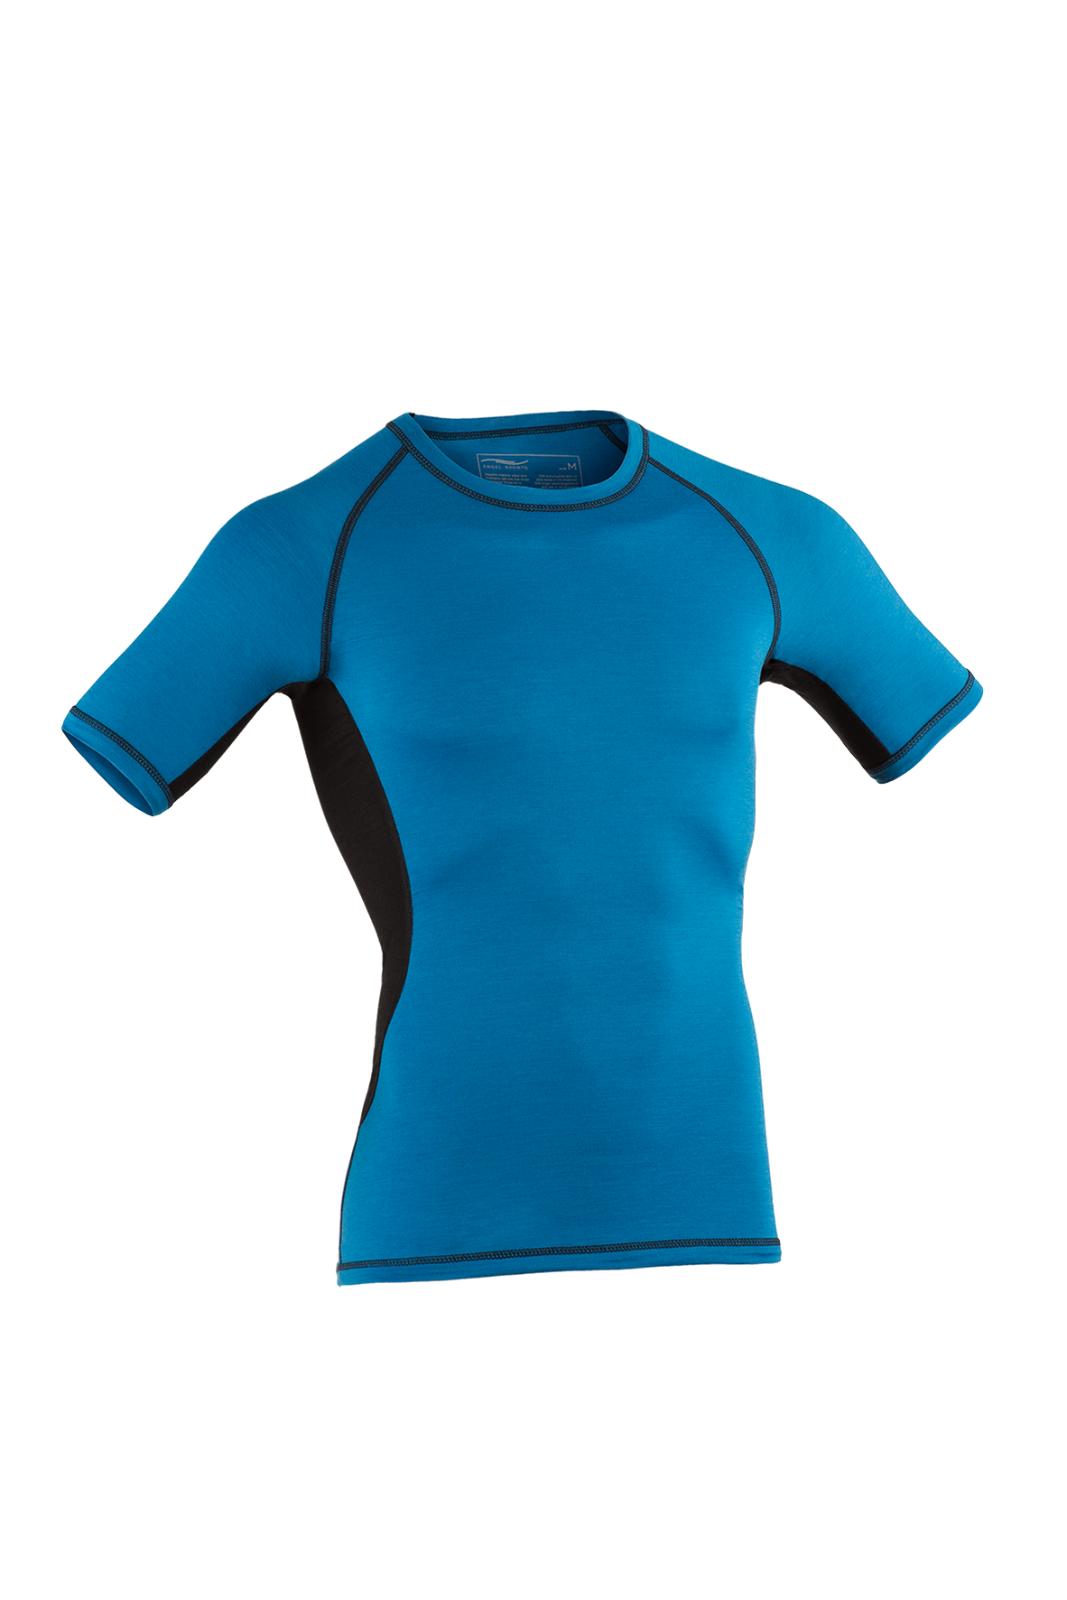 Engel Sports Herren Shirt blau ESM150202120 Funktionskleidung GOTS zertifiziert